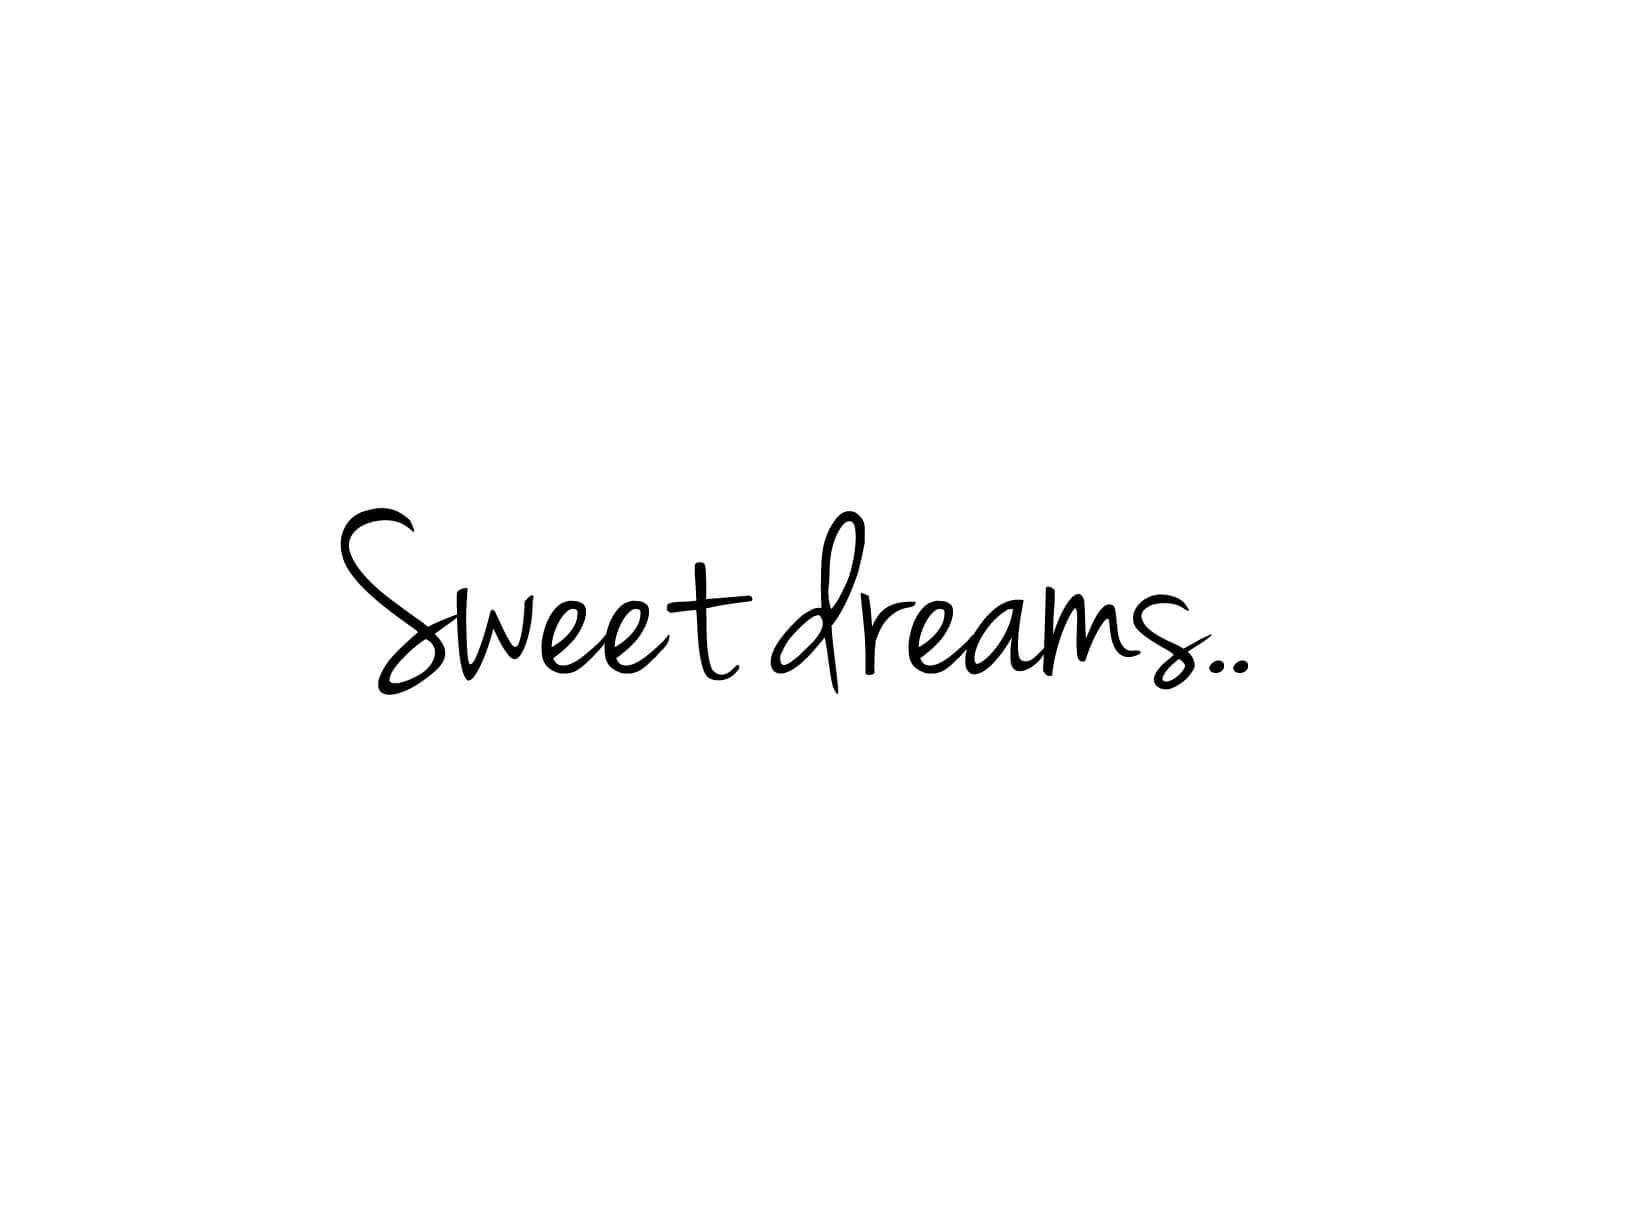 Muursticker Sweet dreams  Muurstickers